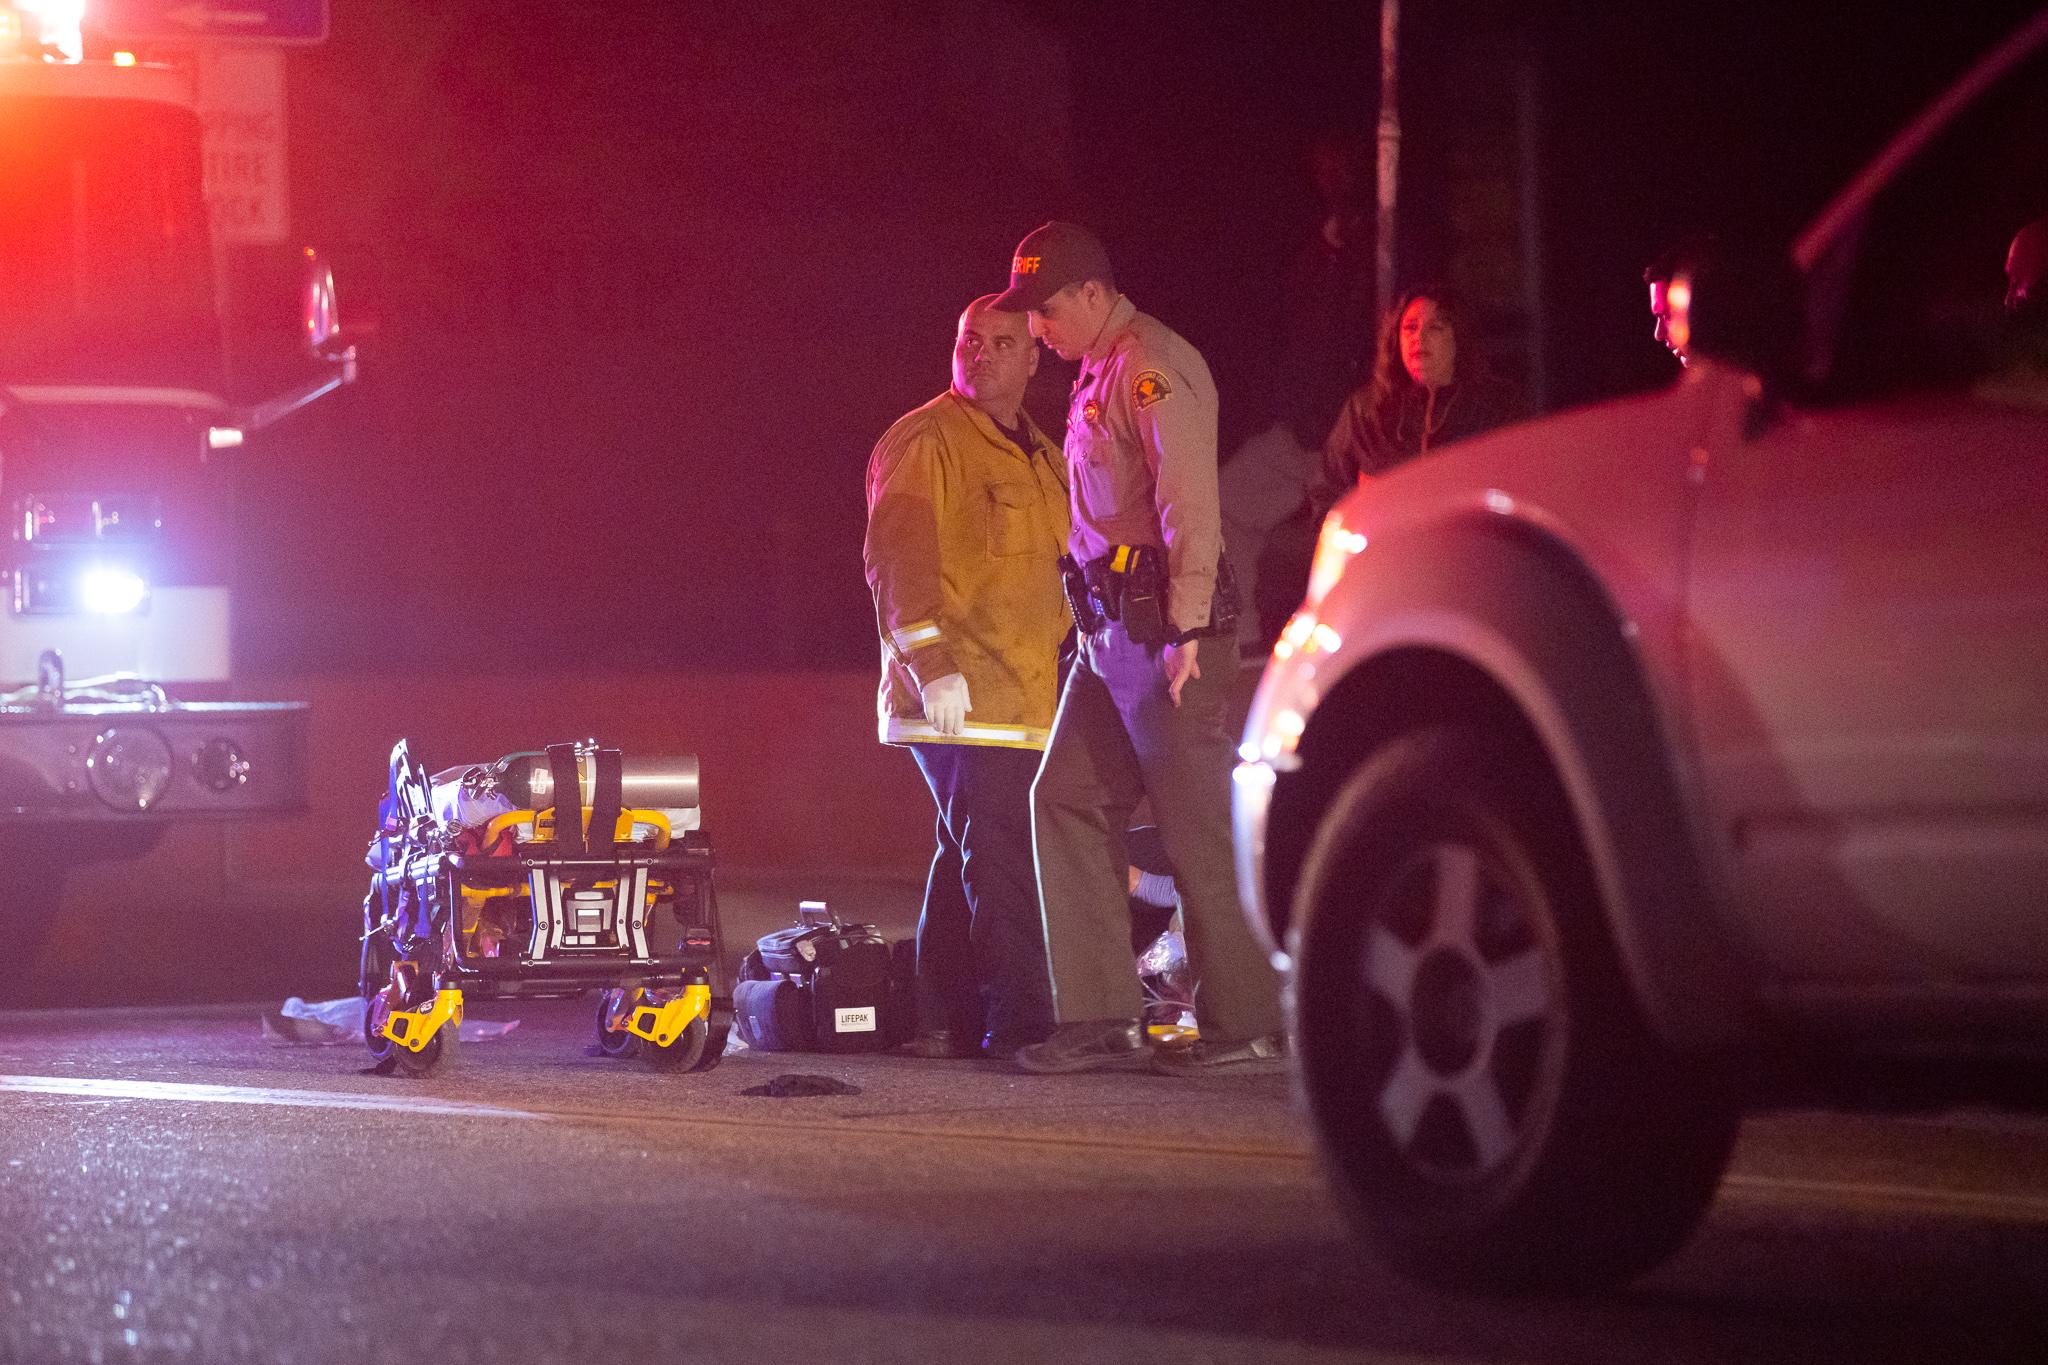 pedestrian struck on hesperia rd in victorville